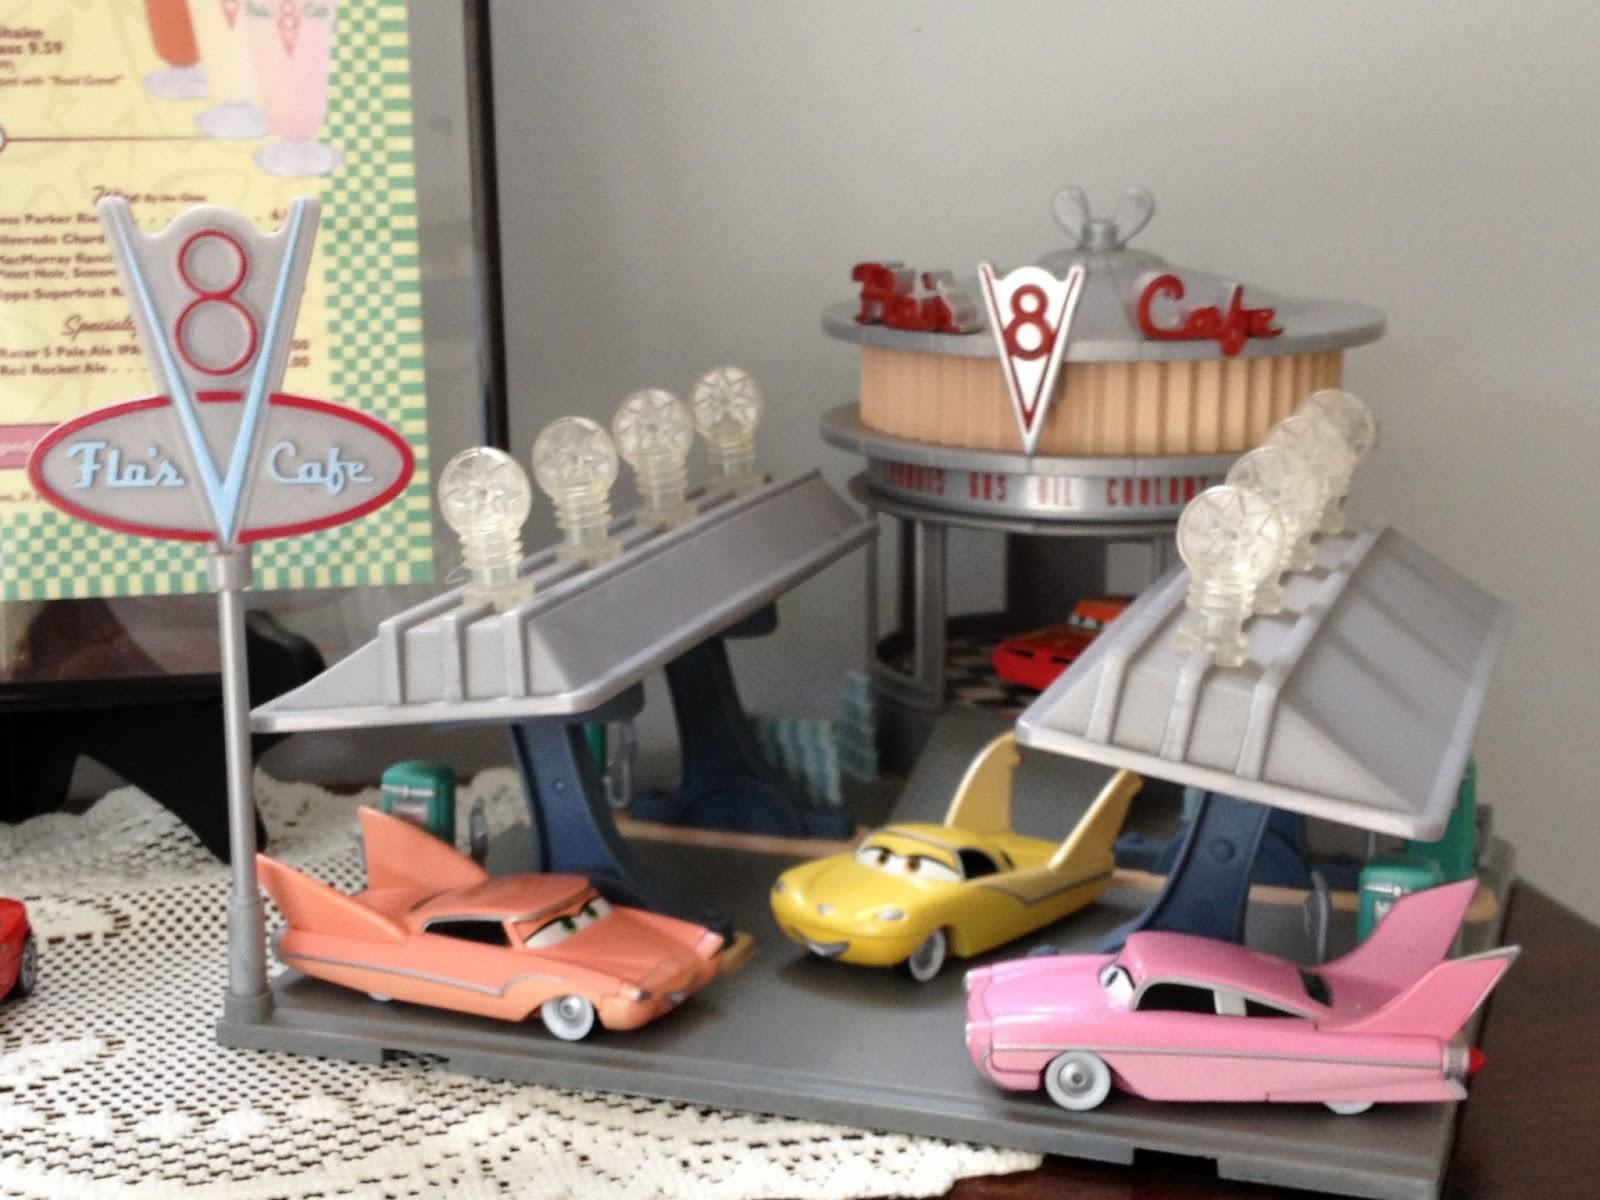 Disney Cars Diecast: Duckman's Blog: New To The Blog: Disney/Pixar Cars Diecast